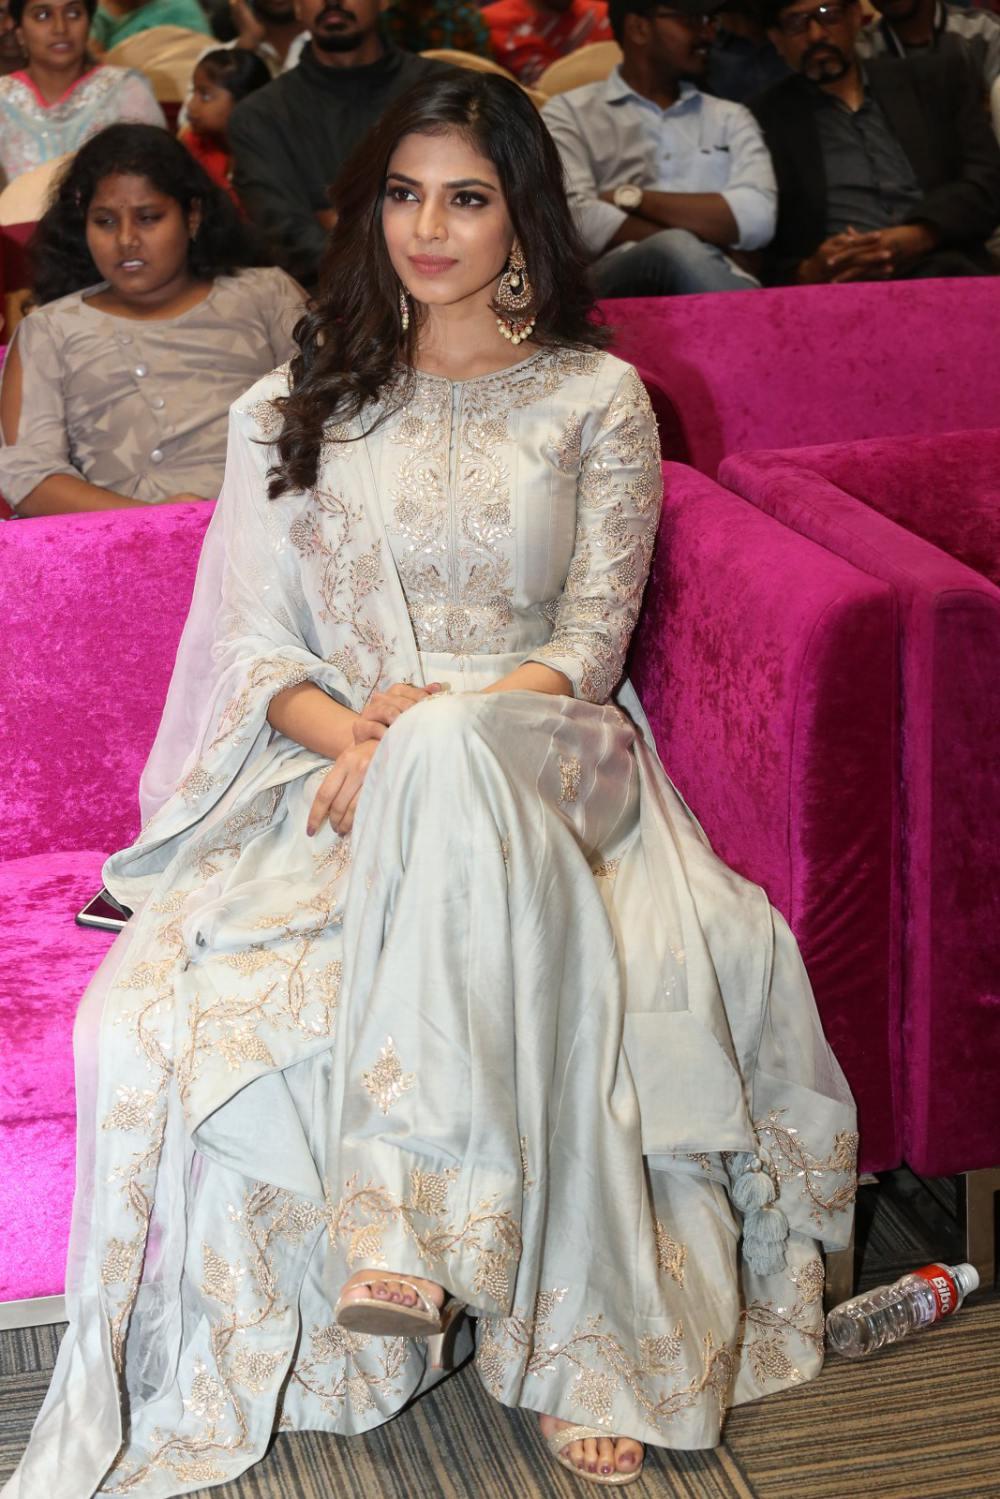 Malavika Mohanan at peta movie audio launch (9)